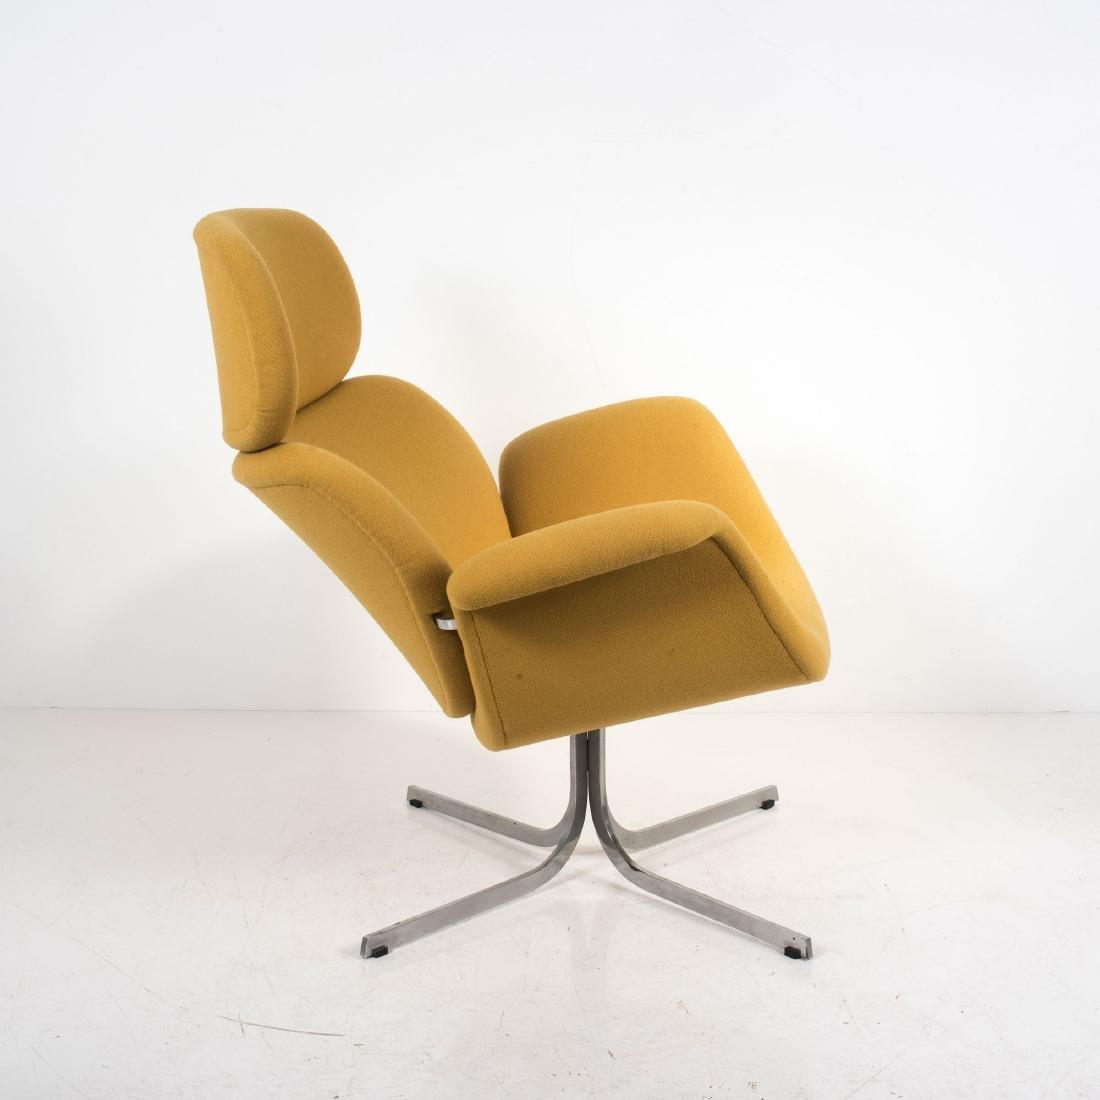 'F 545' - 'Big Tulip' easy chair, 1959 - 6